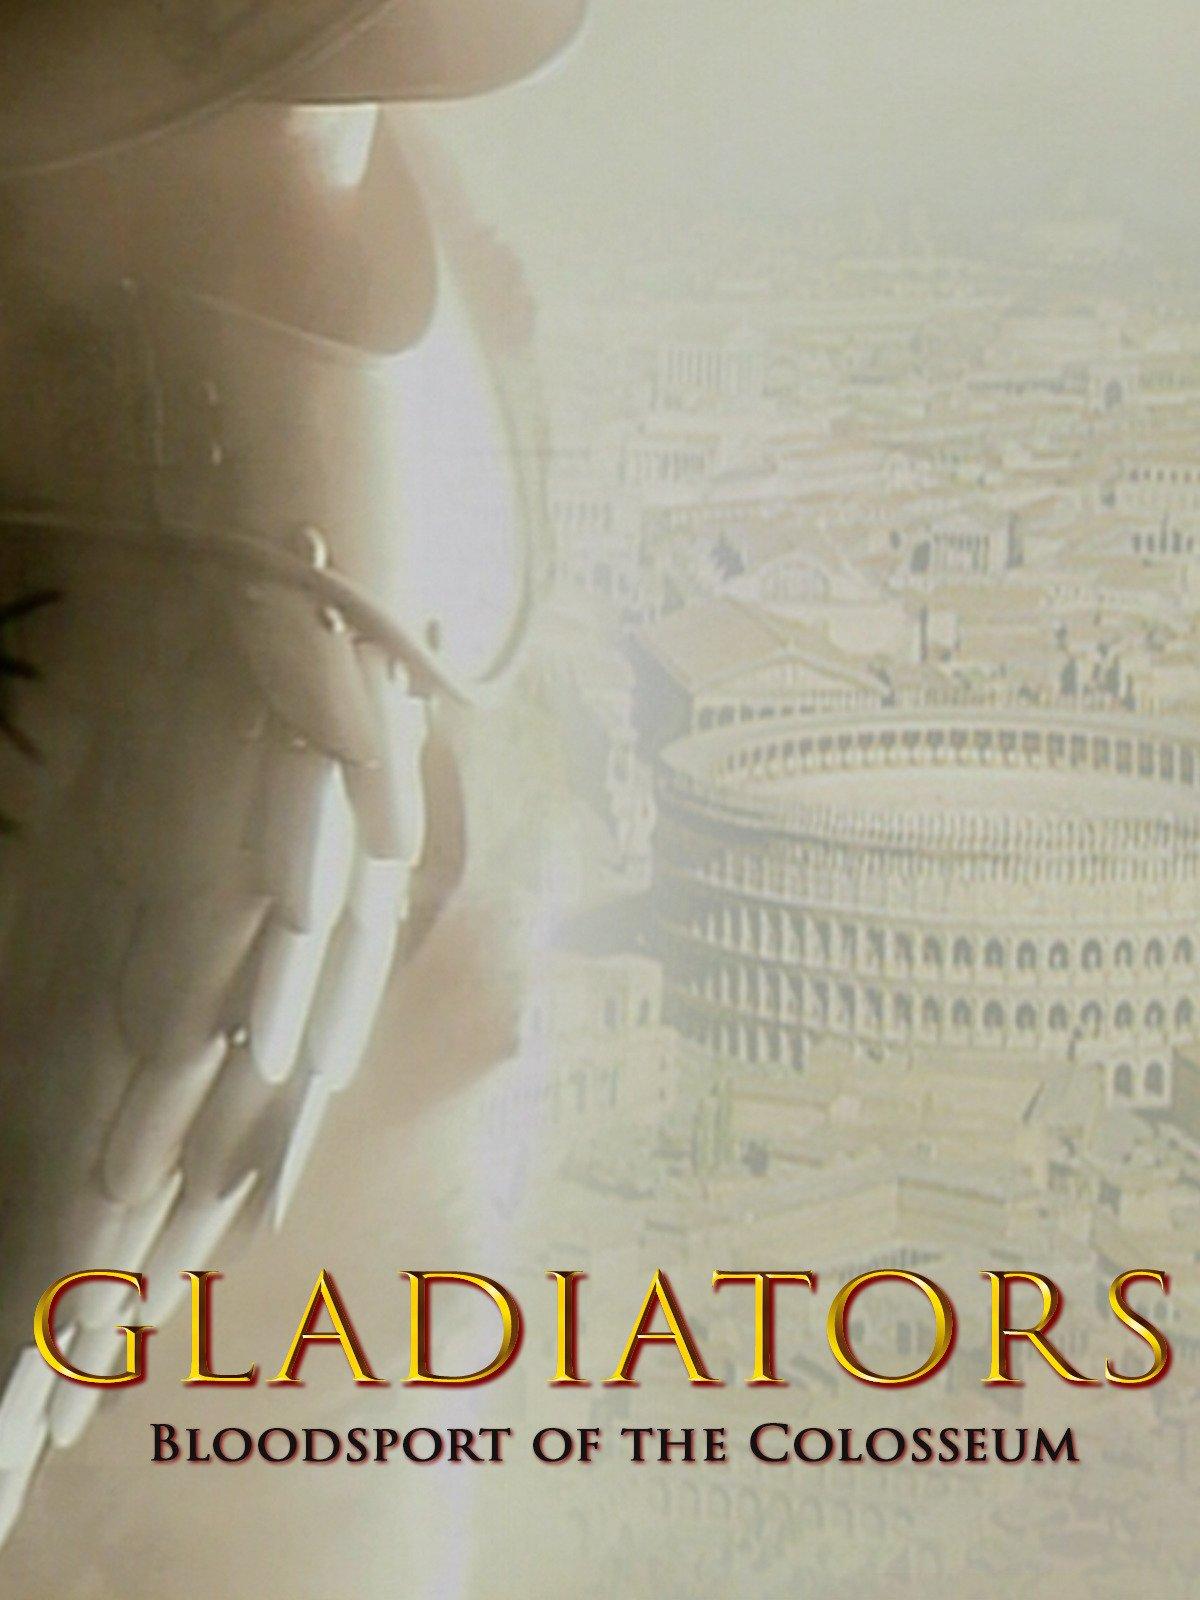 Gladiators: Bloodsport of the Colosseum on Amazon Prime Video UK